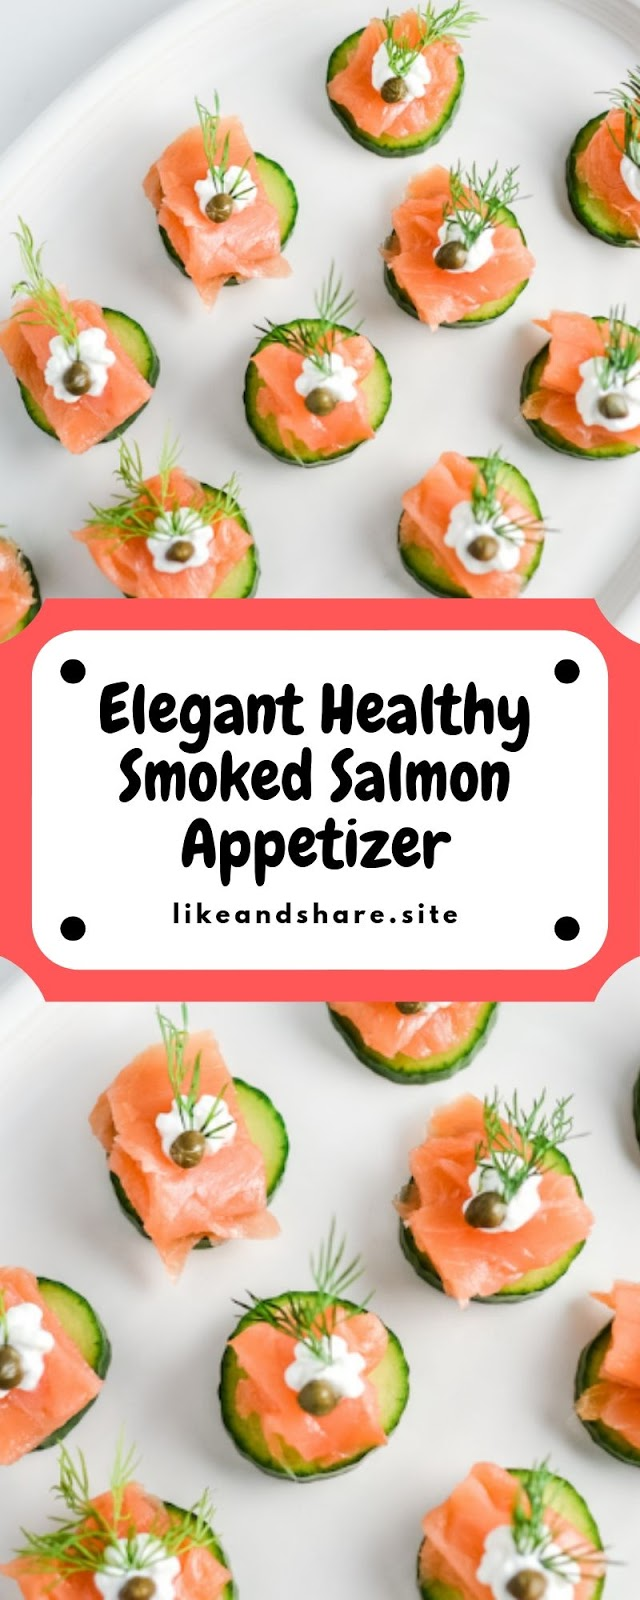 Elegant Healthy Smoked Salmon Appetizer